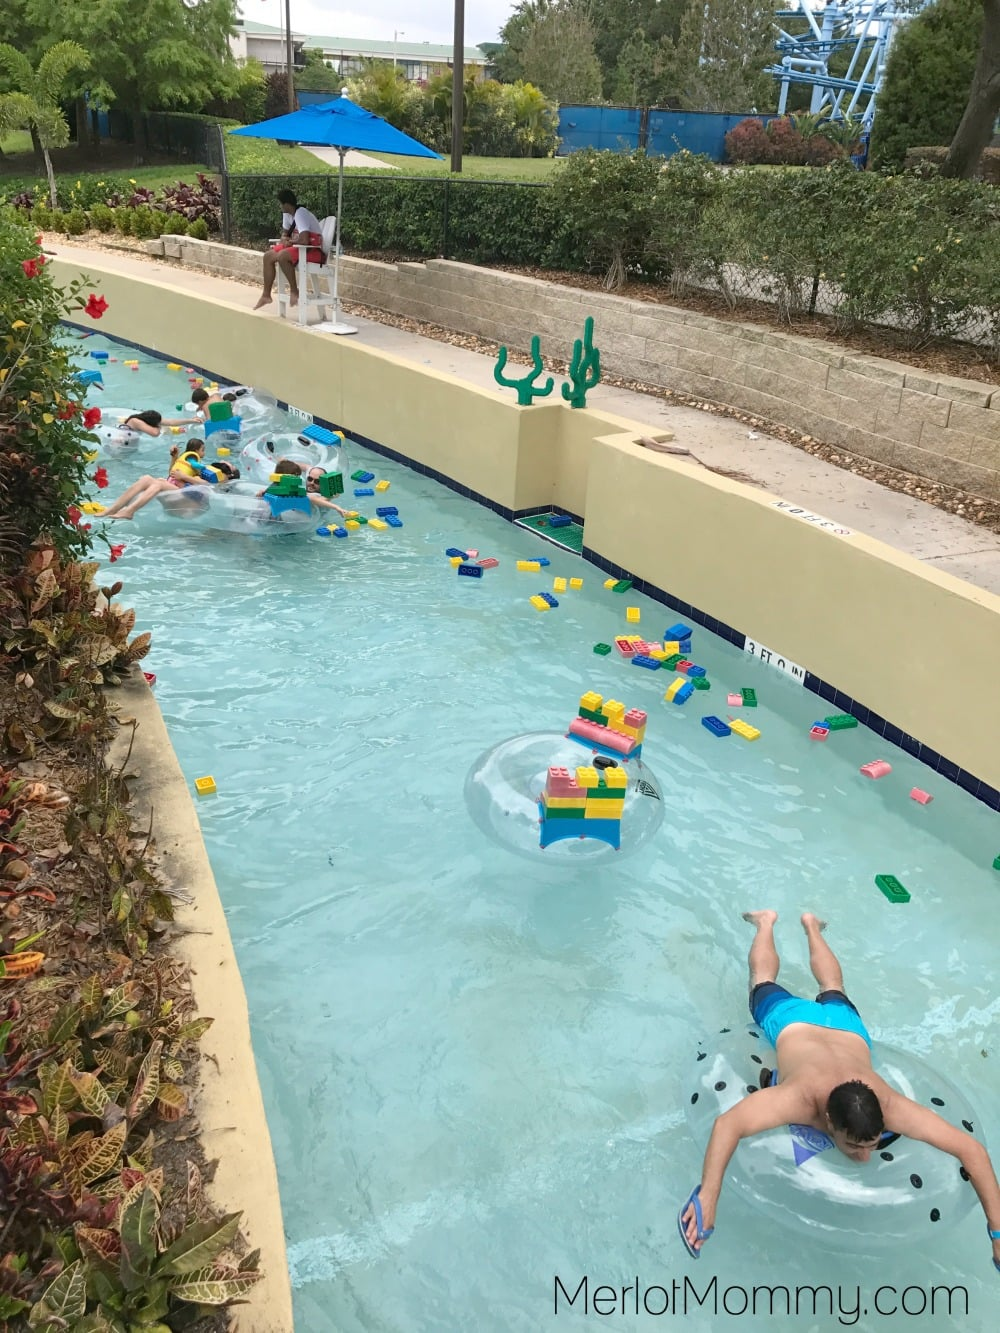 Top 5 LEGOLAND Florida Activities for Tweens and Teens - Lazy River